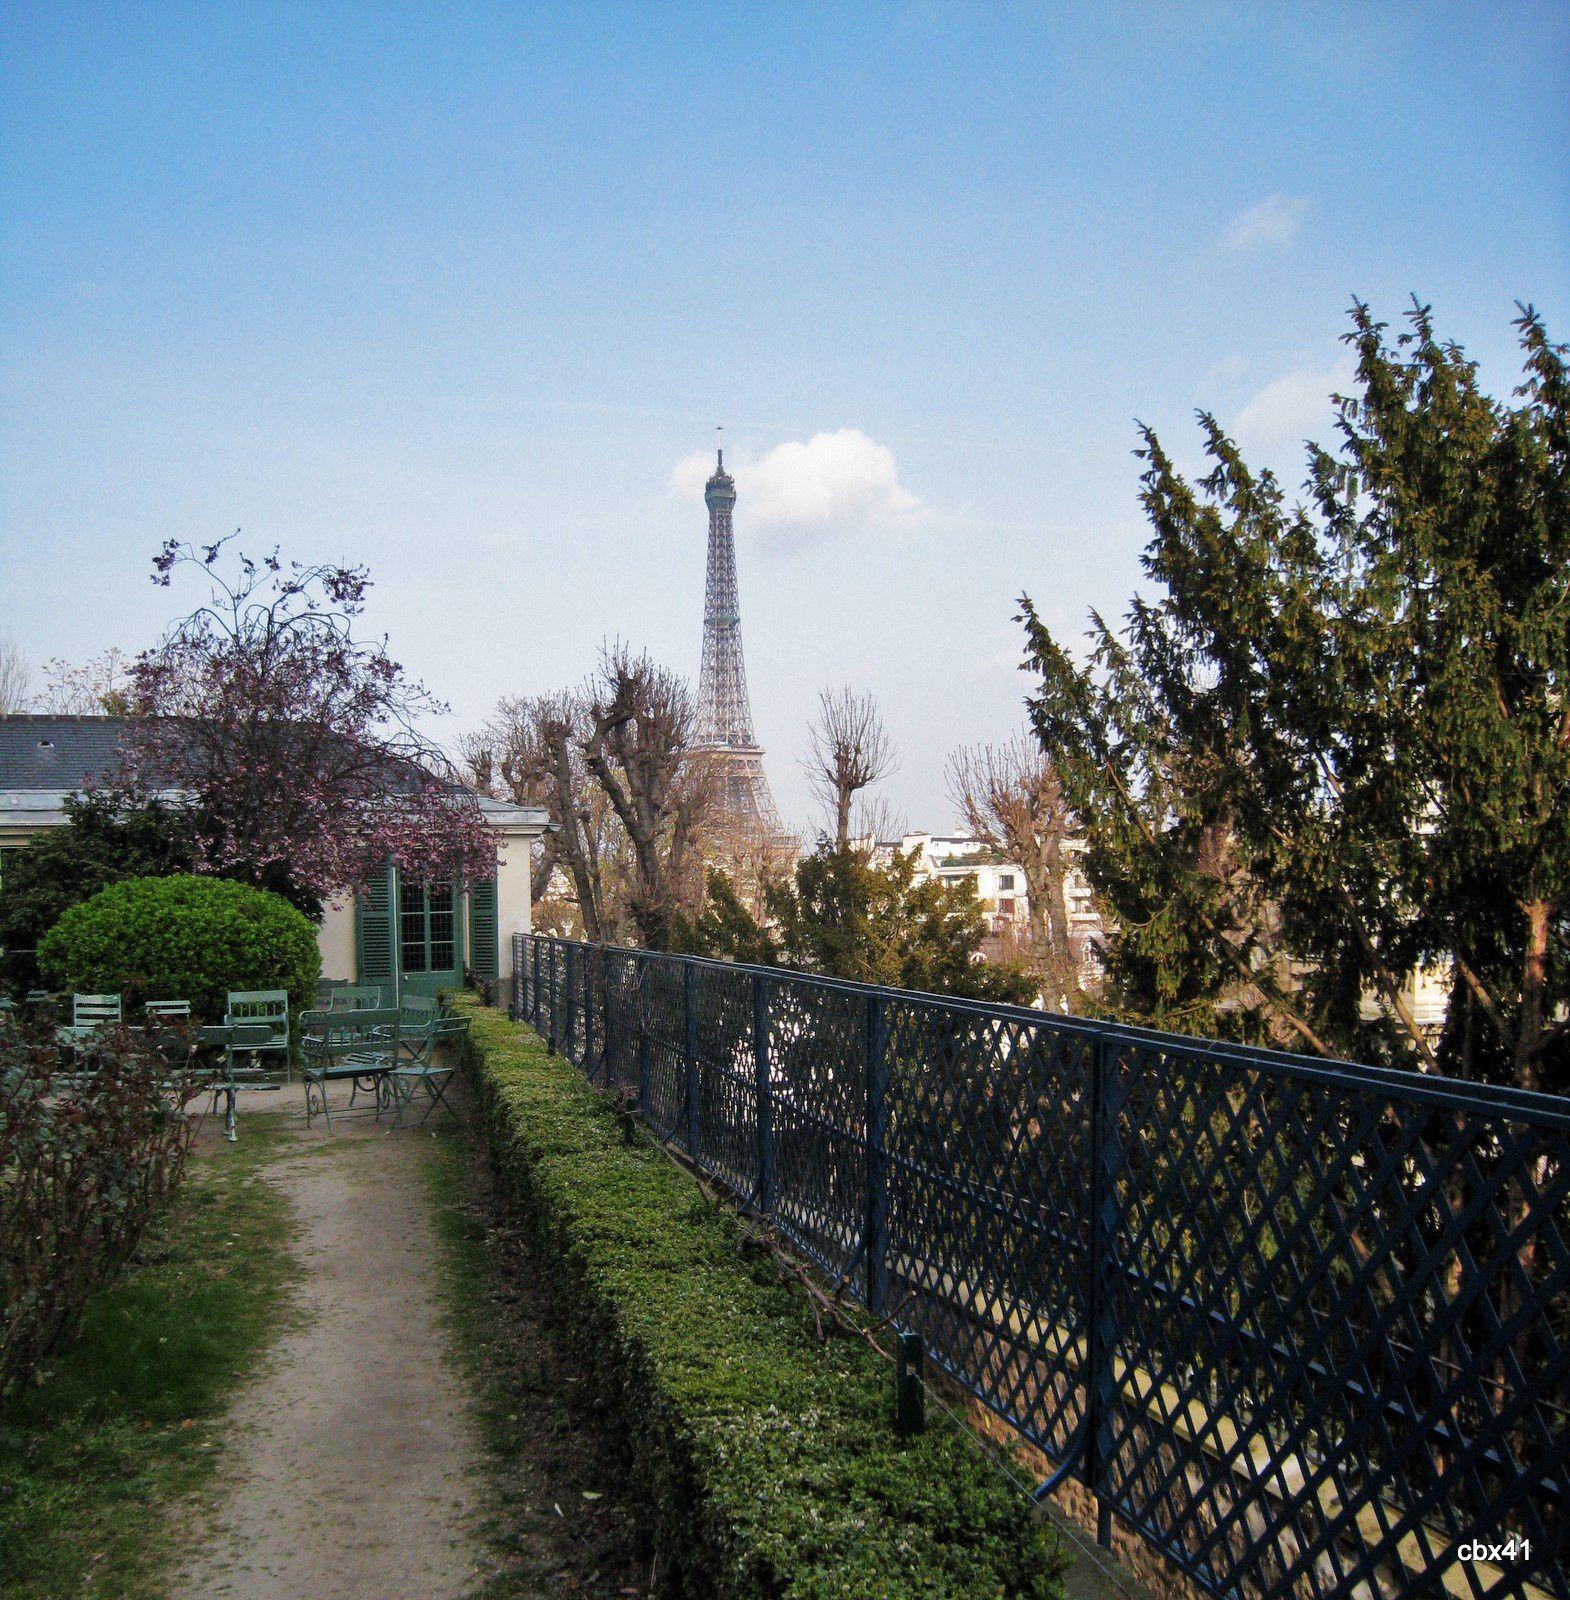 Maison de Balzac, Passy (Paris)